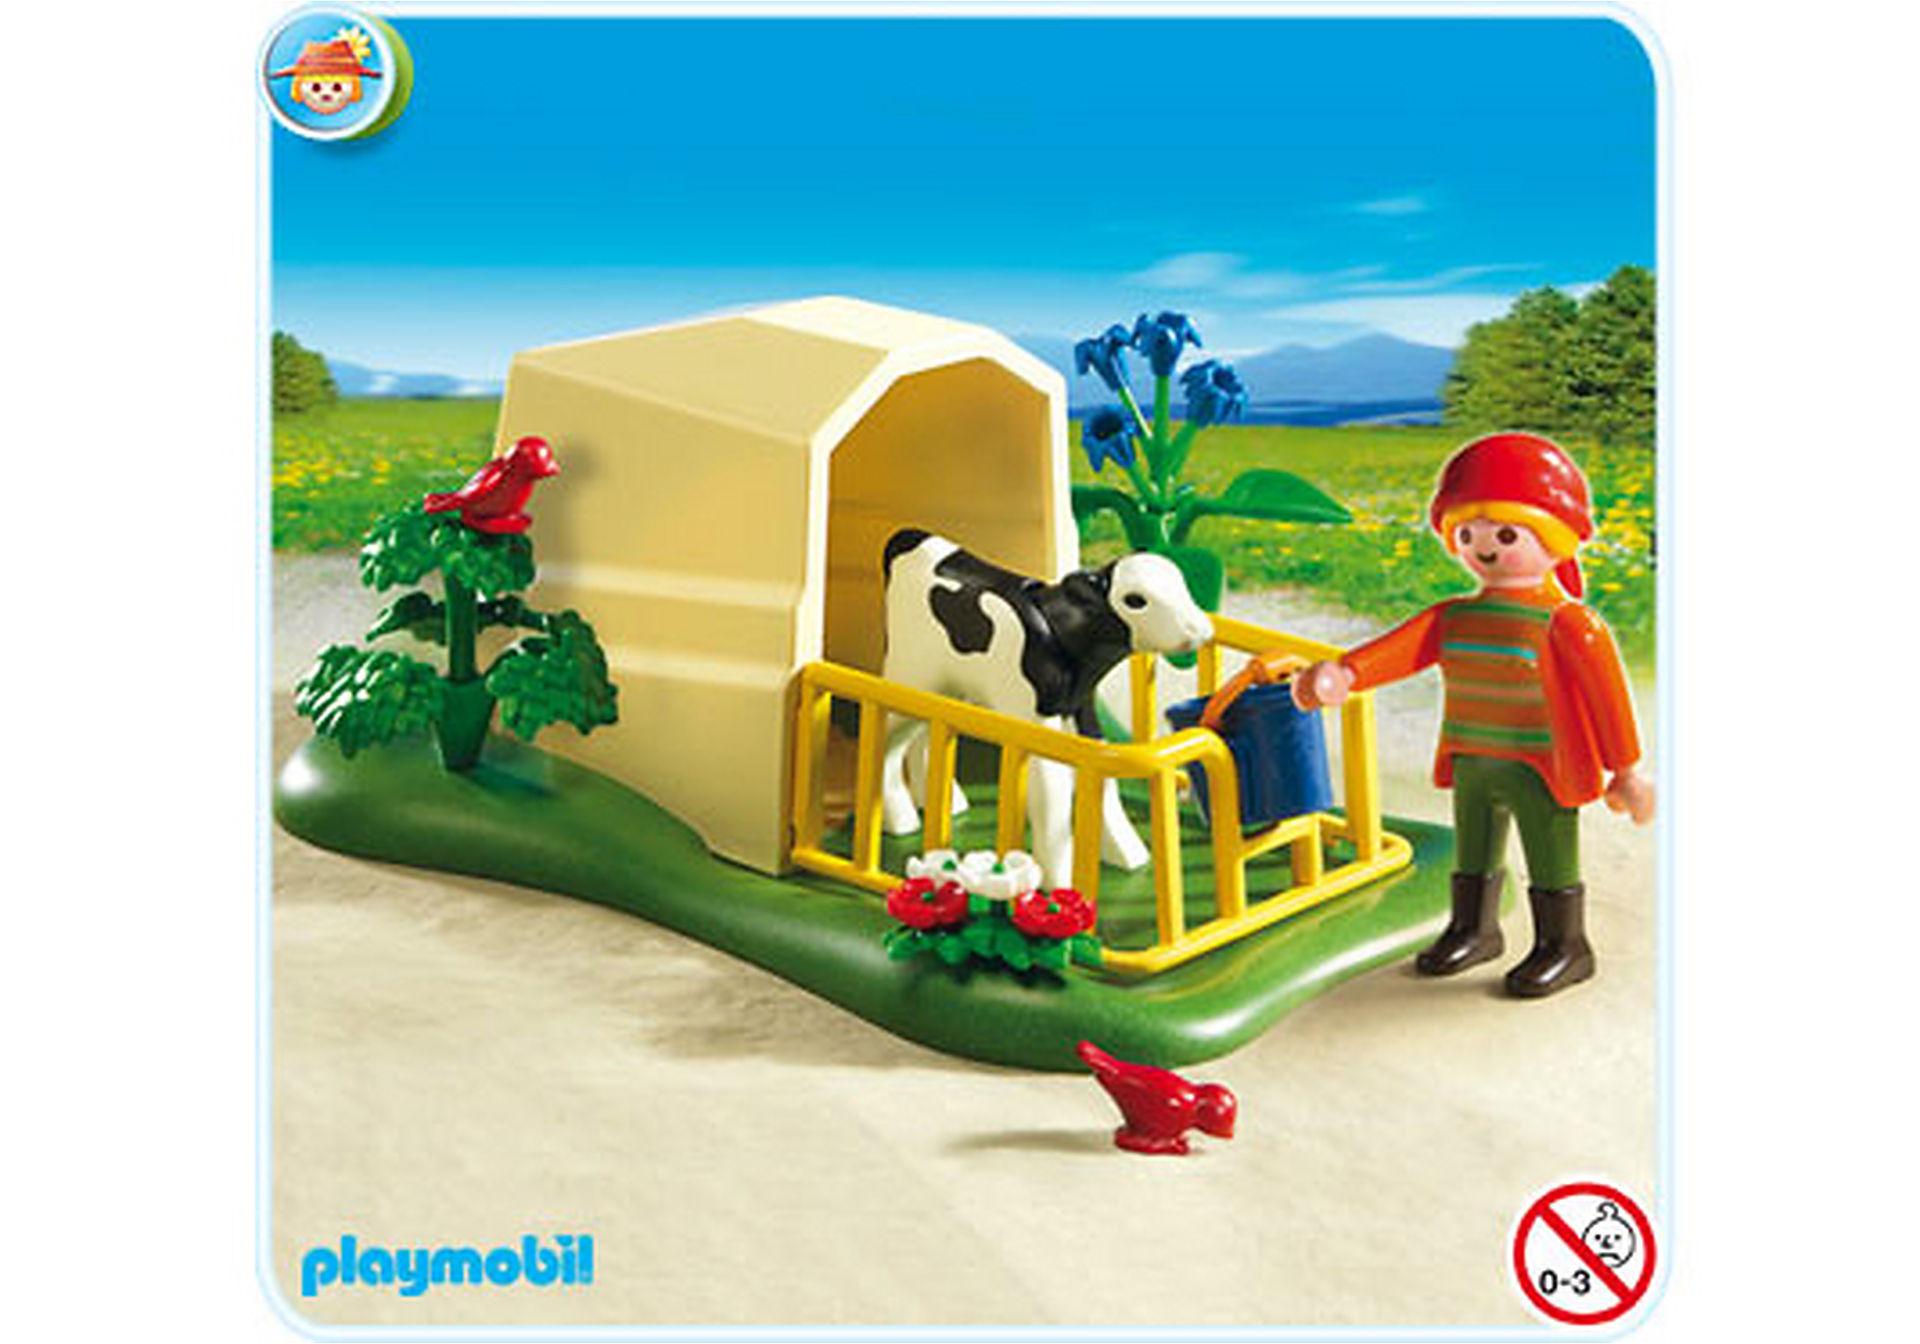 http://media.playmobil.com/i/playmobil/5124-A_product_detail/Kälbchen-Aufzucht